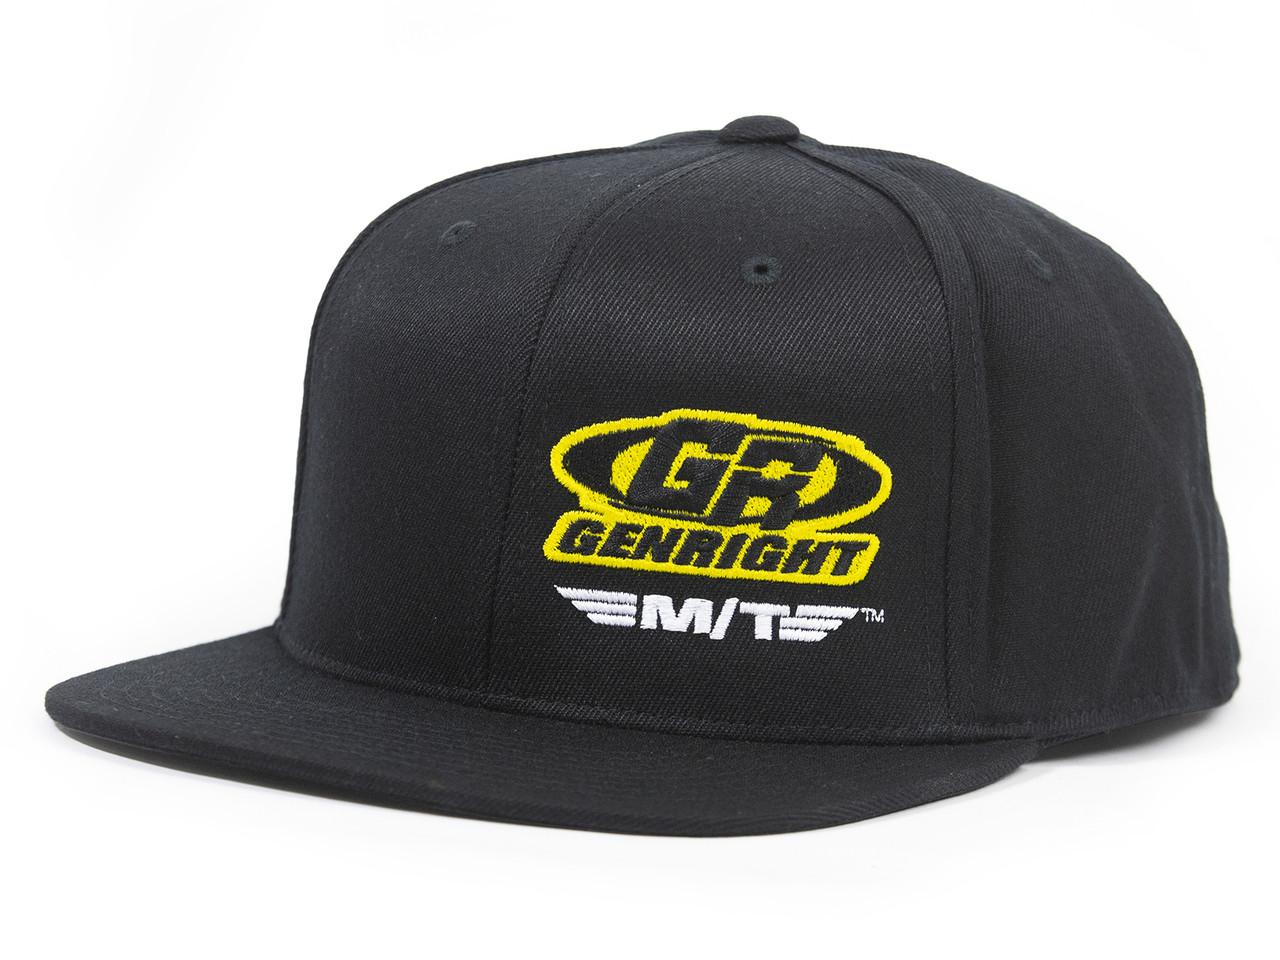 GenRight KOH 2019 Team Edition Snapback Hat